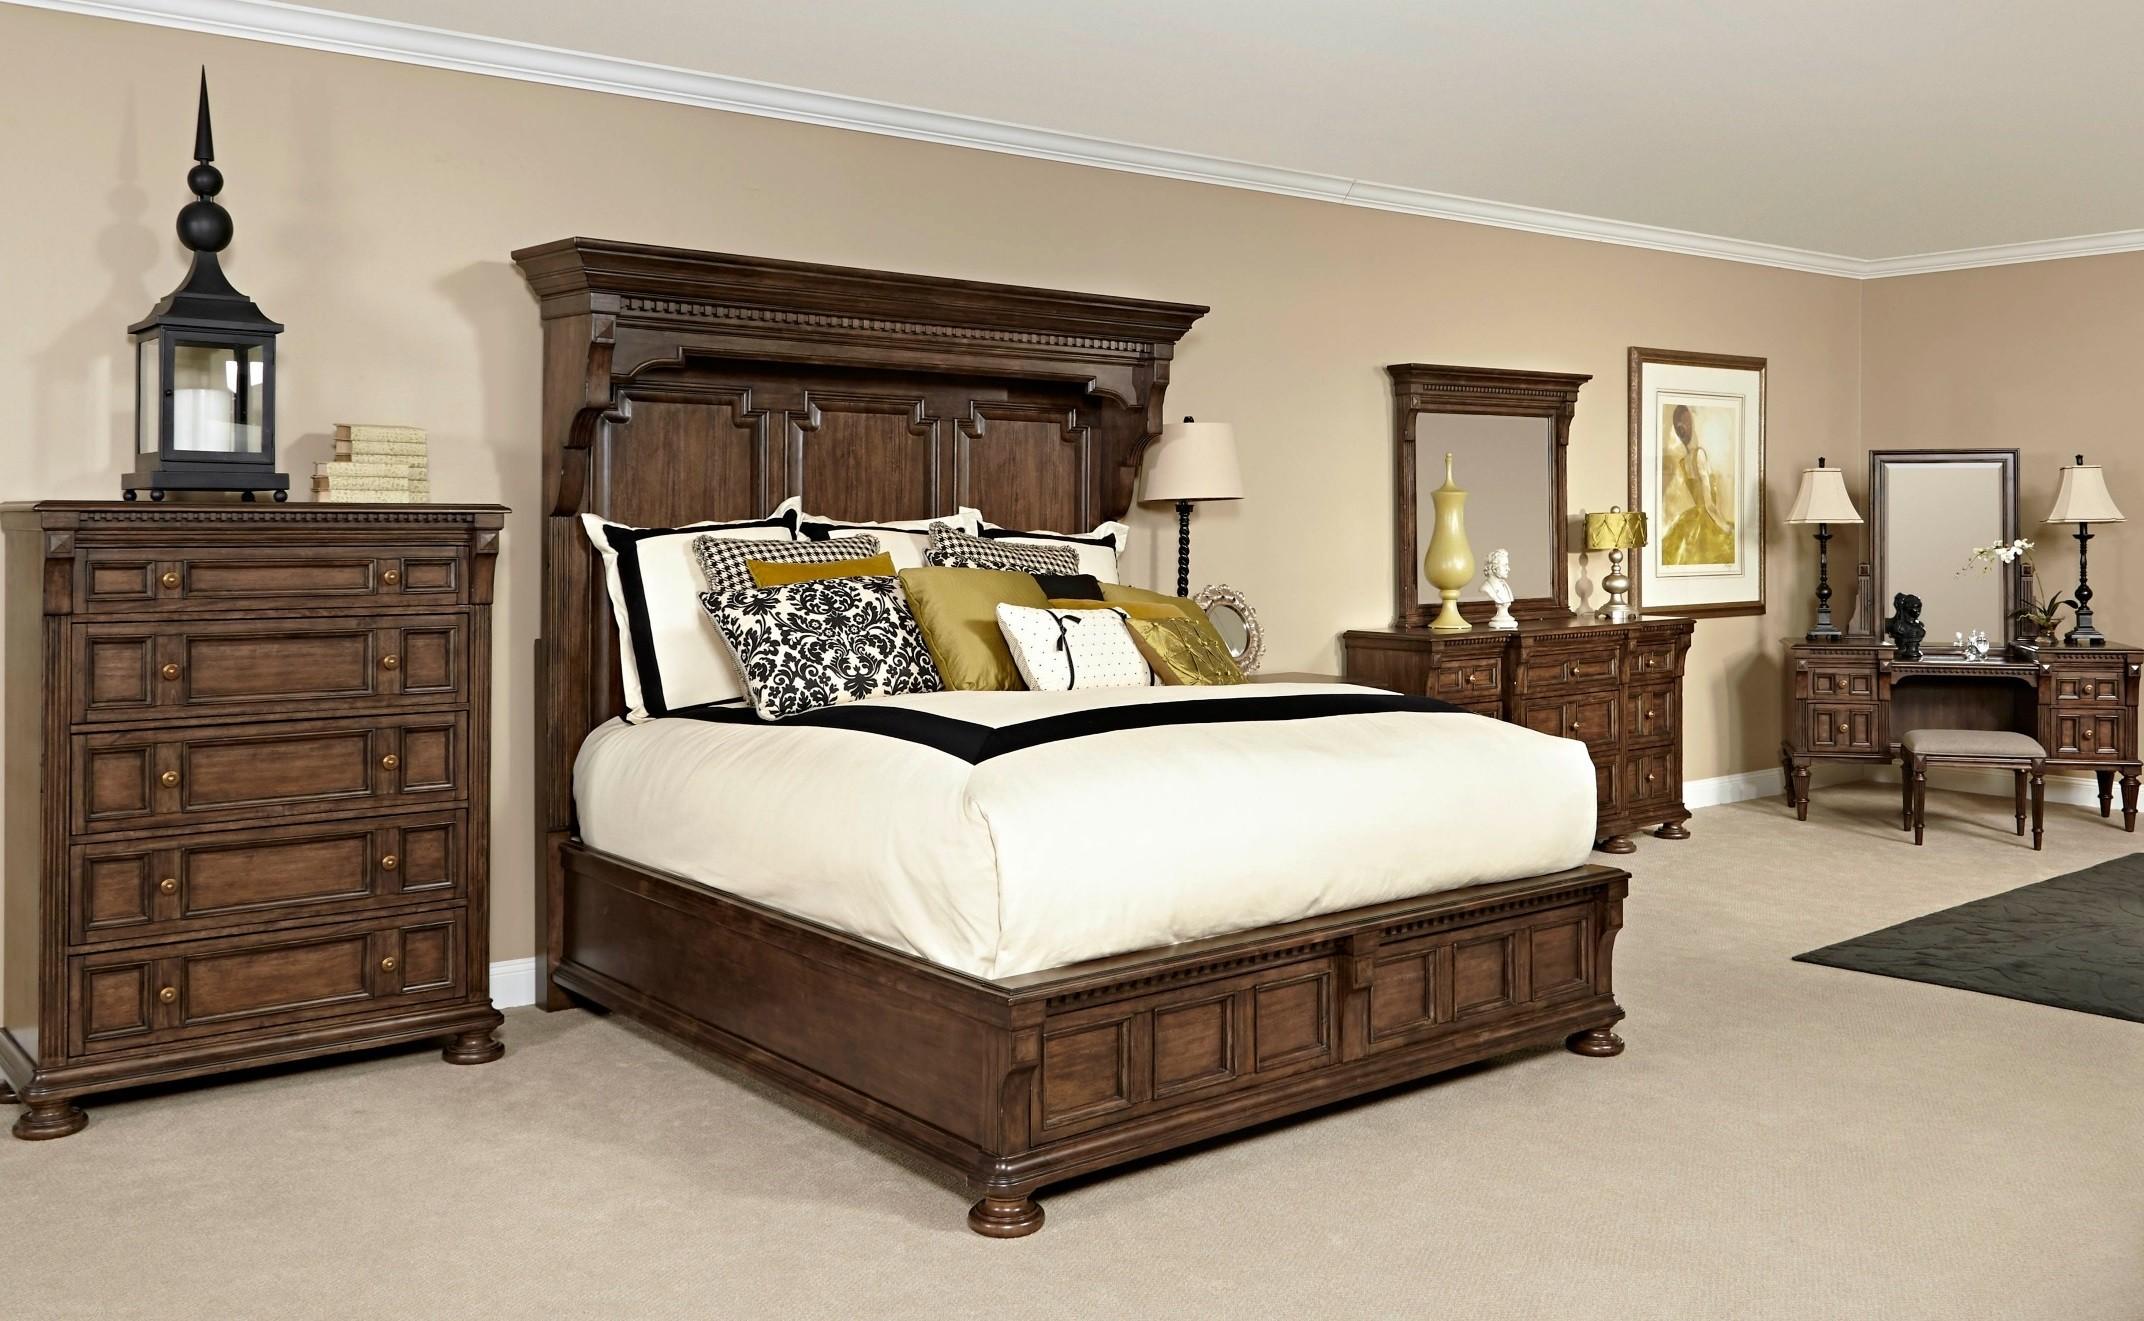 Lyla Mansion Bedroom Set From Broyhill 4912 260 265 460